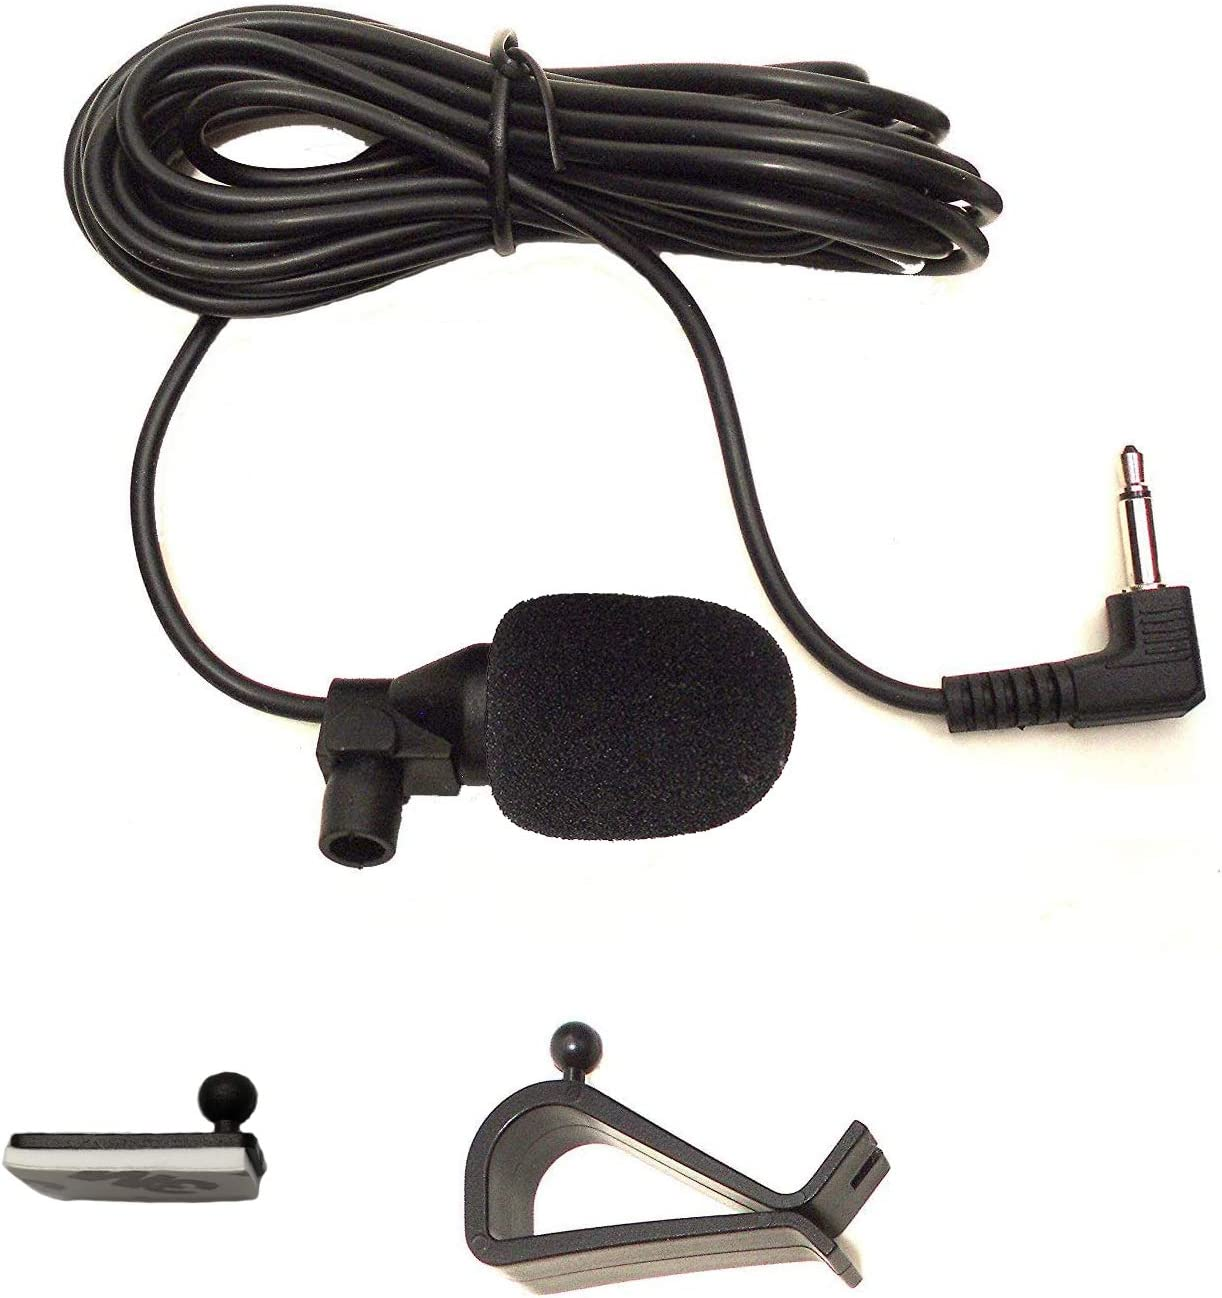 M I C Skaa 27 Kfz Auto Radio Antenne Adapter Fakra Iso Din Für Navigation Vw Rns Rcd Plus Skoda Octavia Seat Bmw Audi Av8v6 Ab8 Avm8 Avm9 Au7 Elektronik